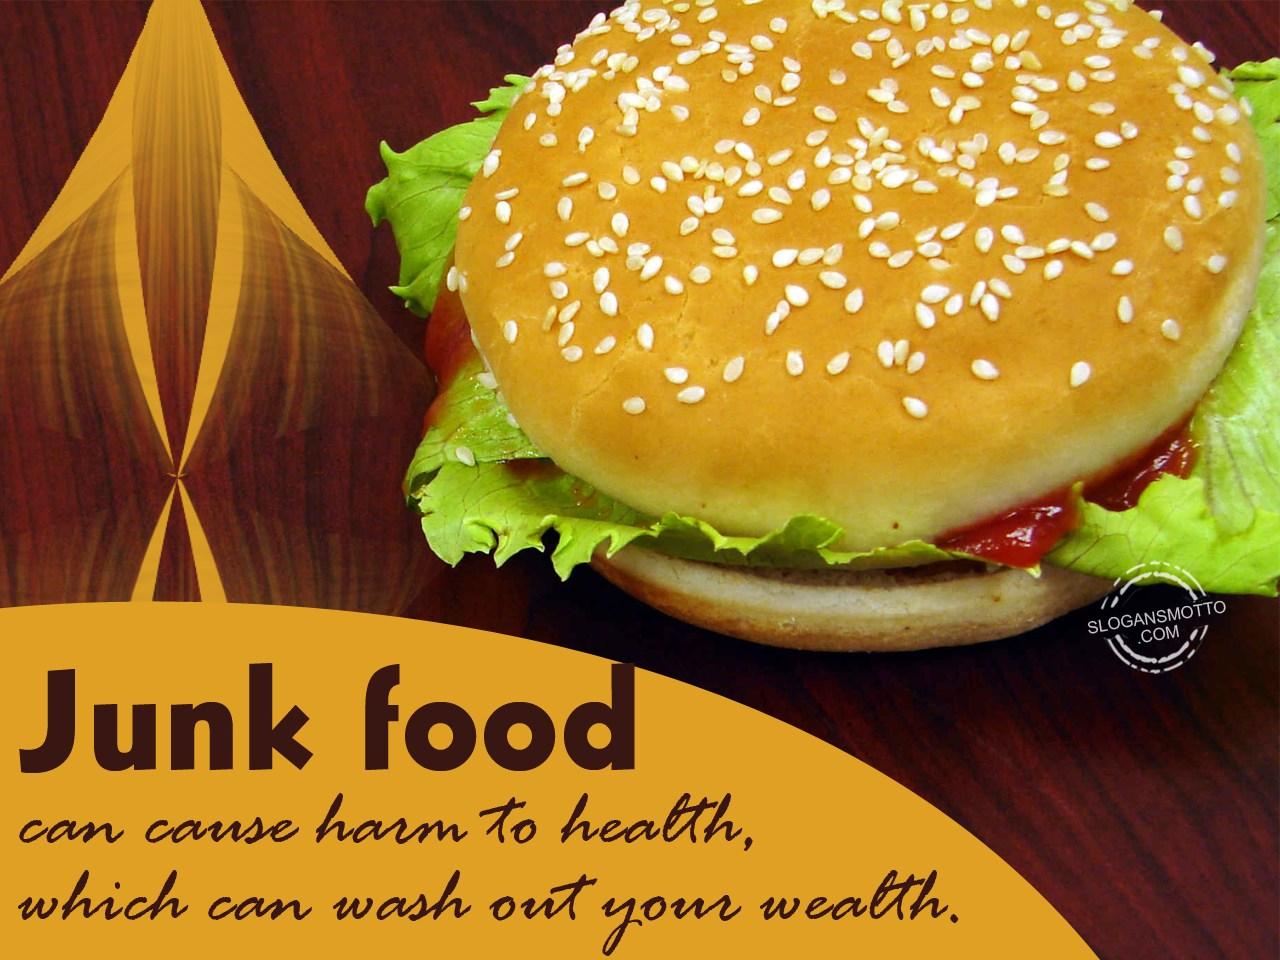 Junk Food Kills